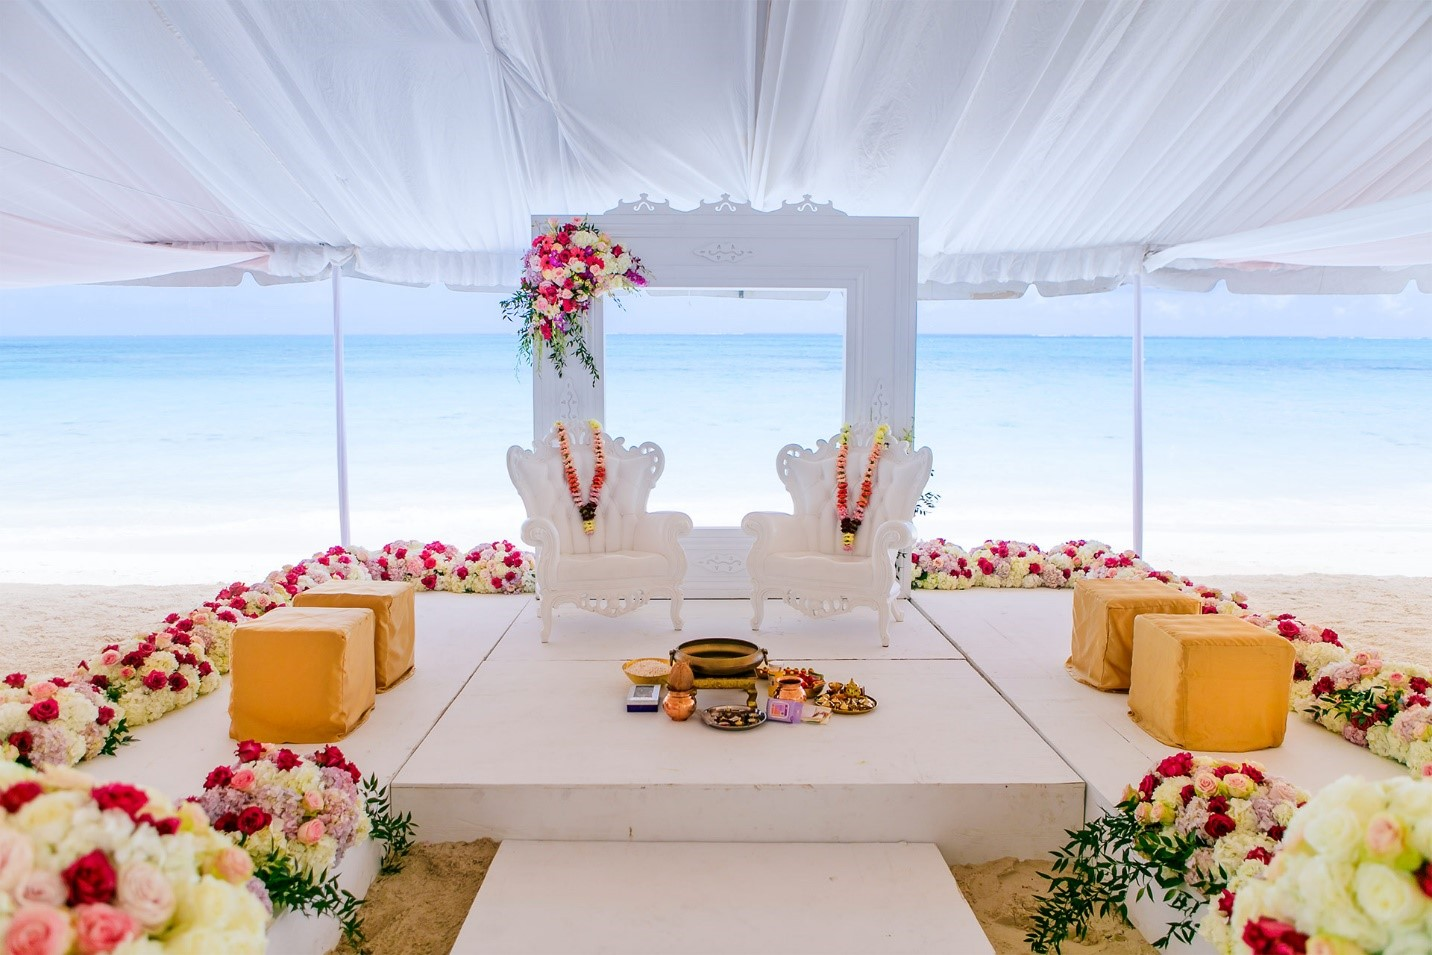 Wedding Decor for Mandap at Beaches Turks and Caicos